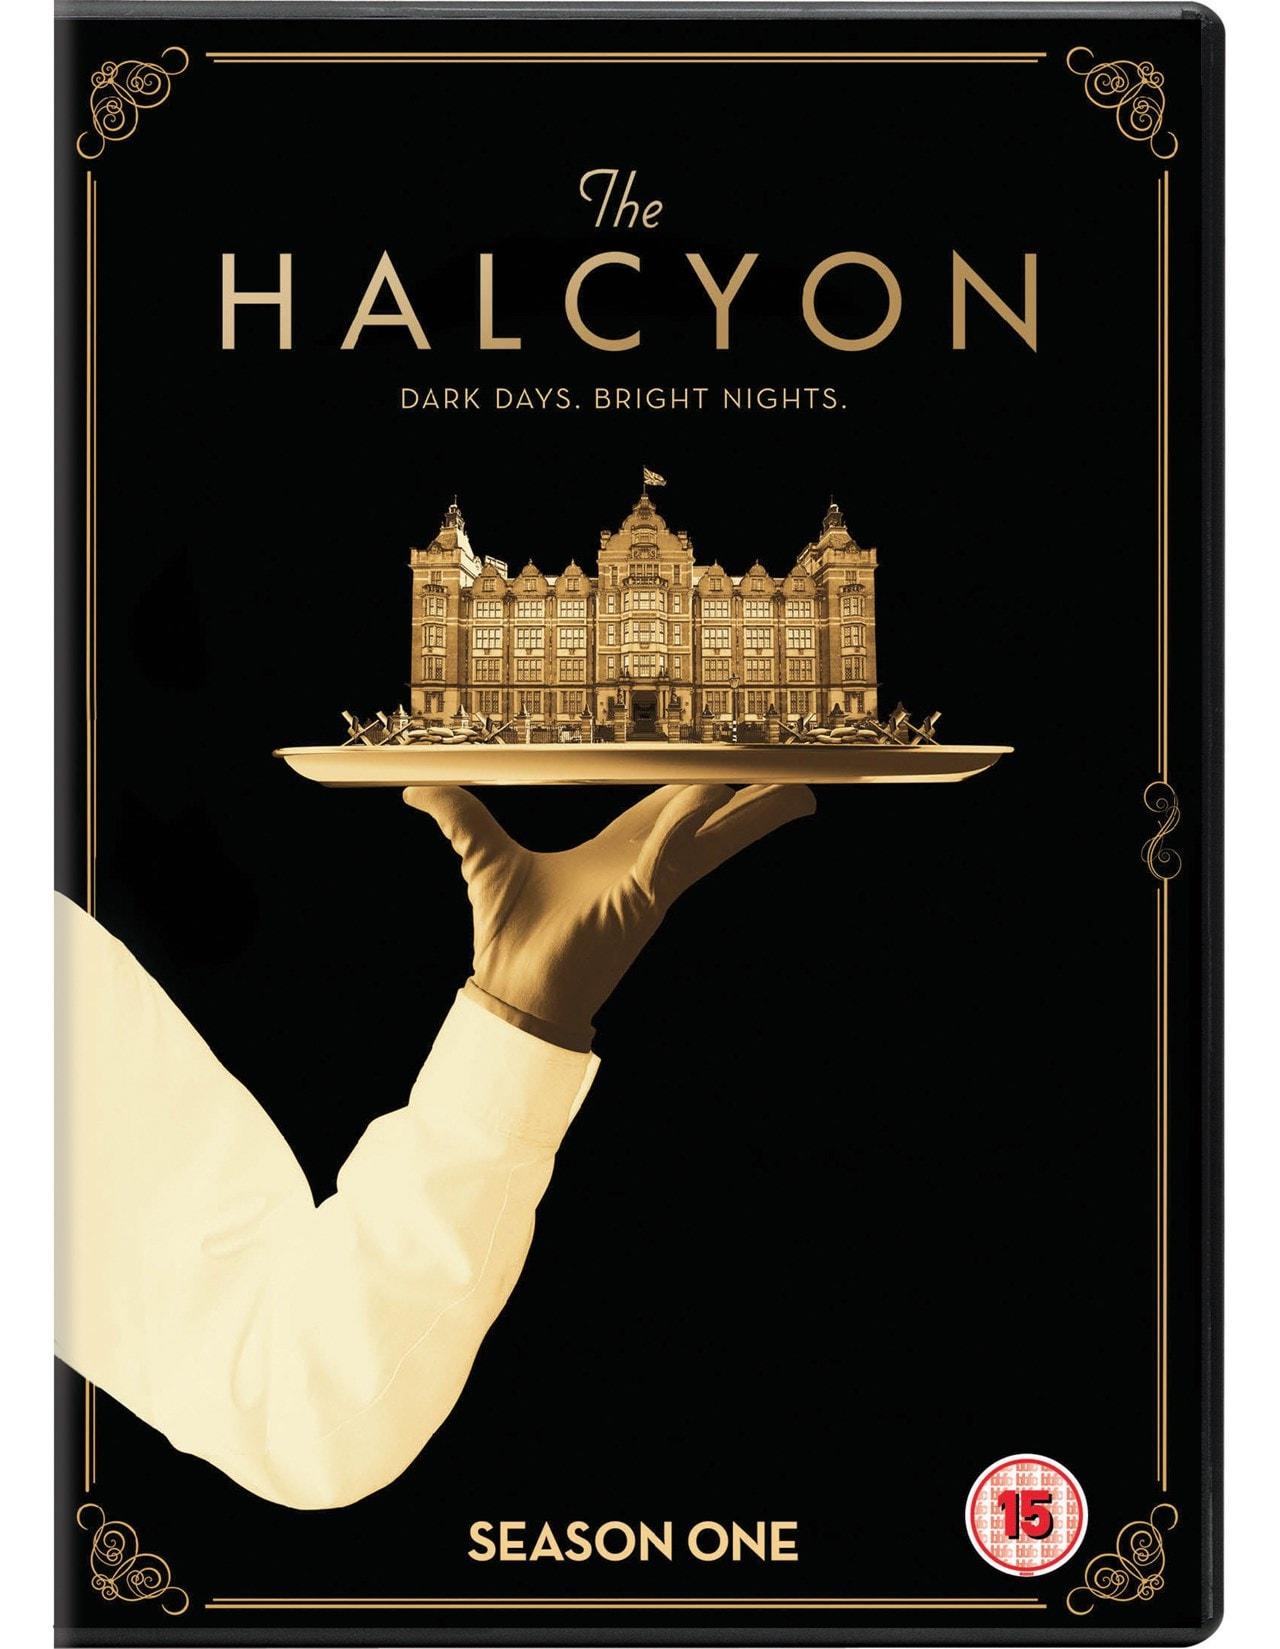 The Halcyon: Season One - 1